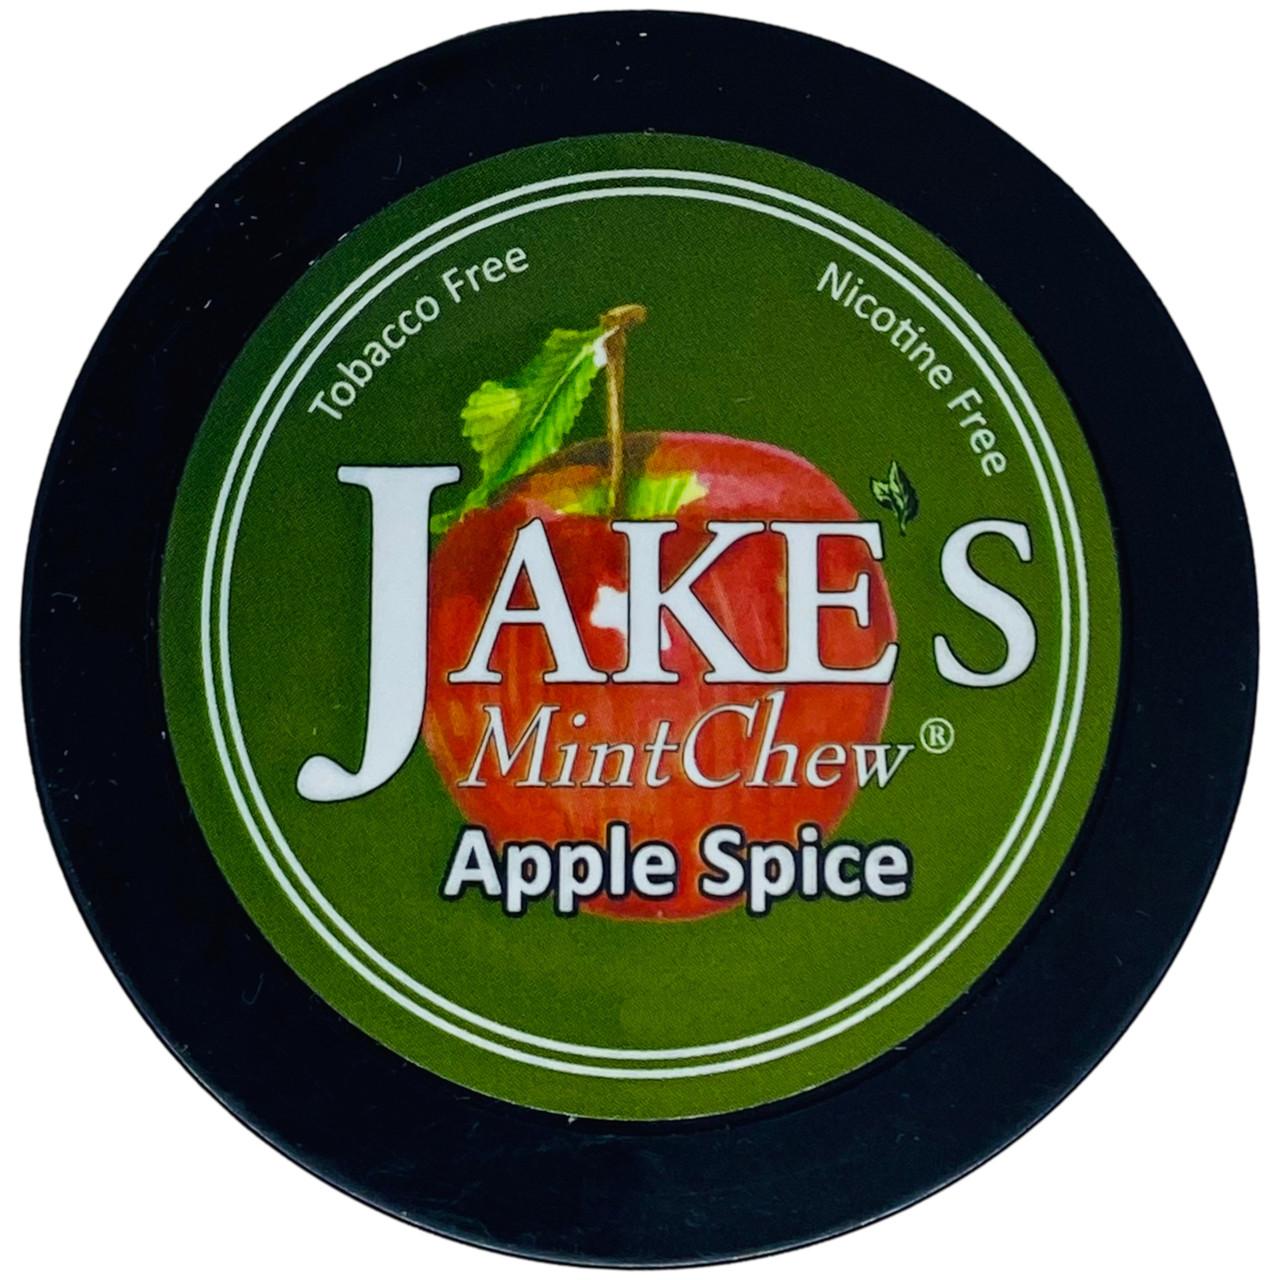 Jake's Mint Chew Apple Spice 1 Can